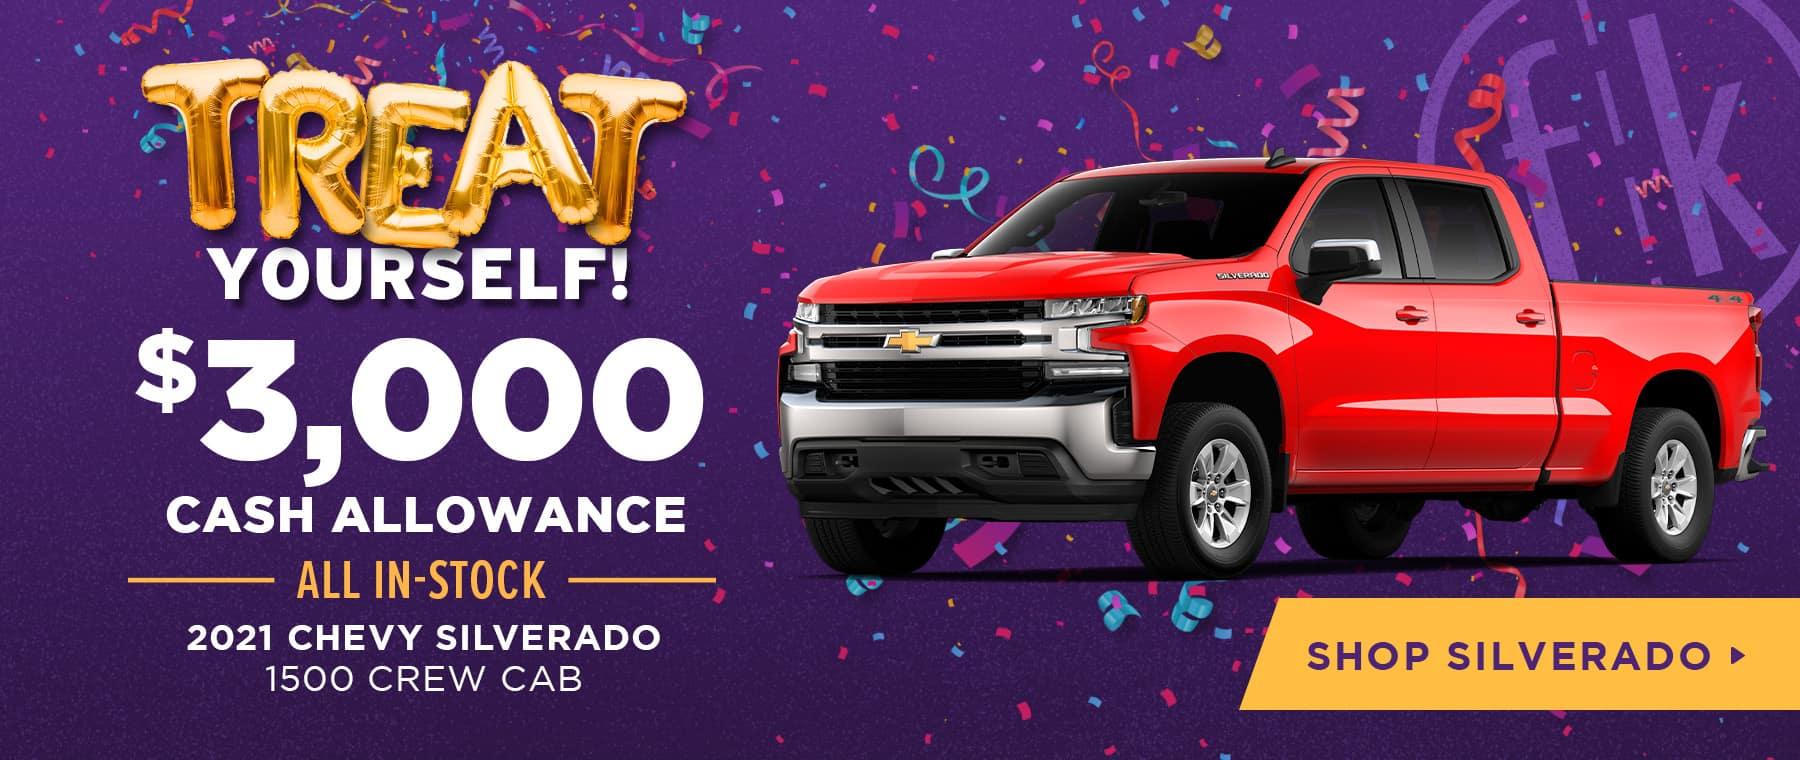 $3,000 Cash Allowance All In-Stock 2021 Chevy Silverado 1500 Crew Cab